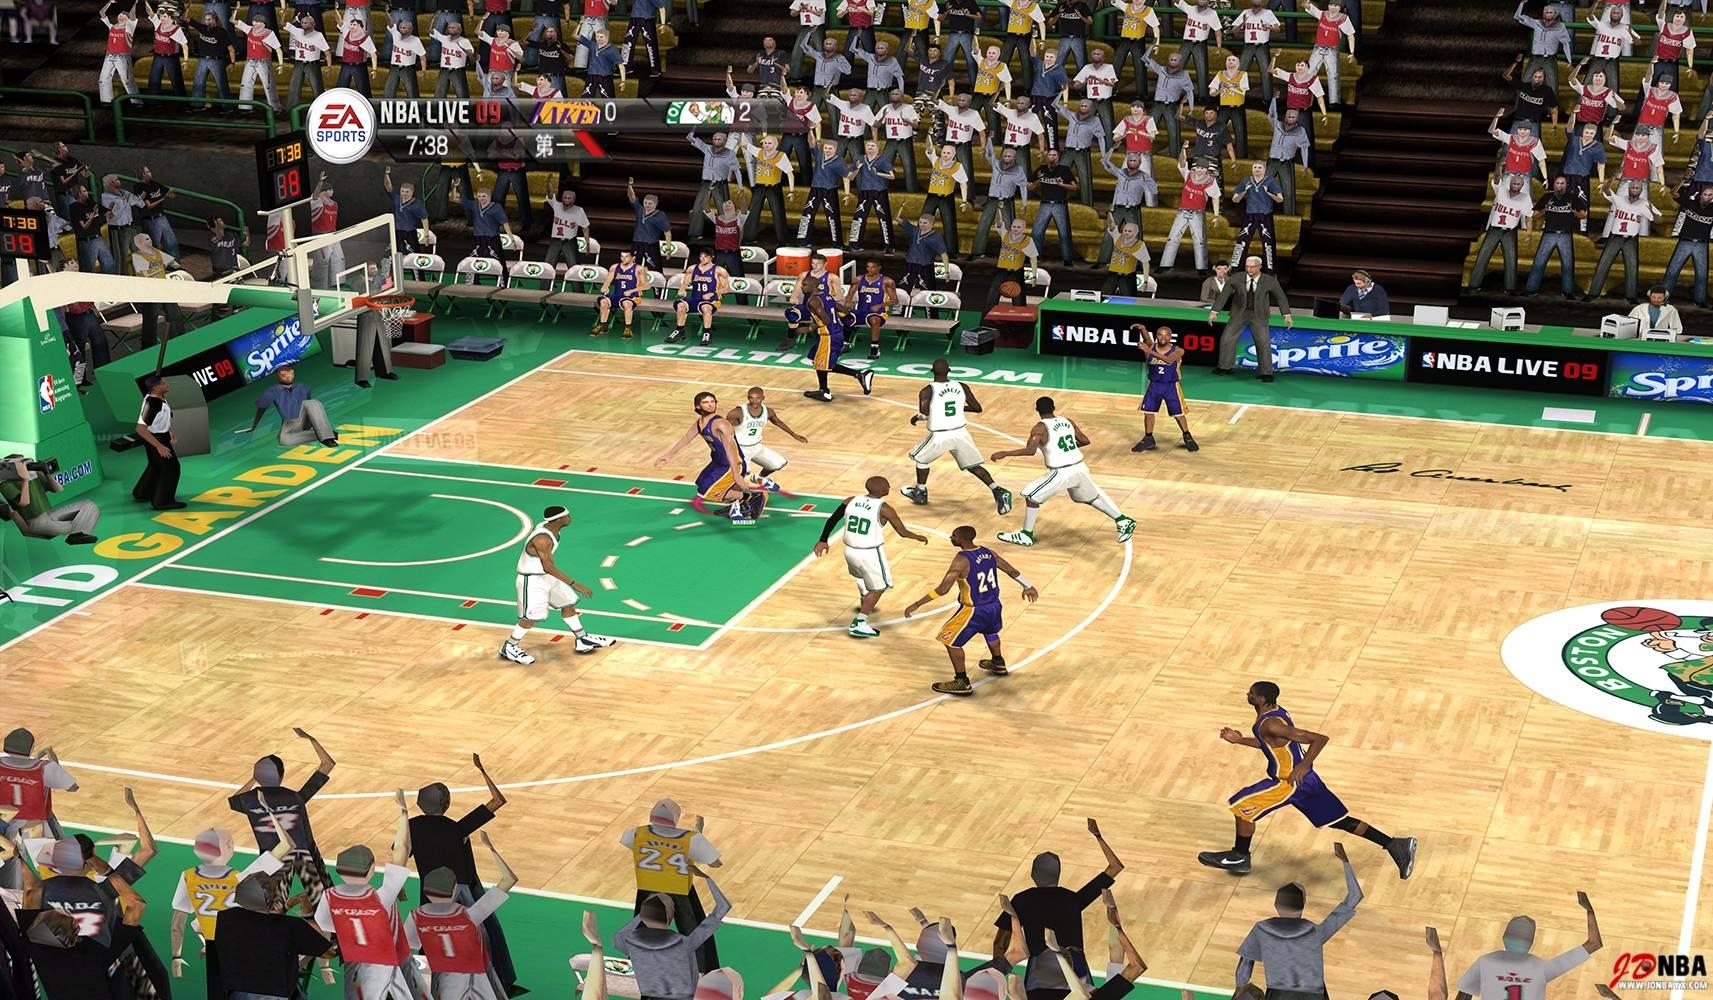 NBA LIVE 09【4K】-2021-06-26-00-12-22-308副本.jpg